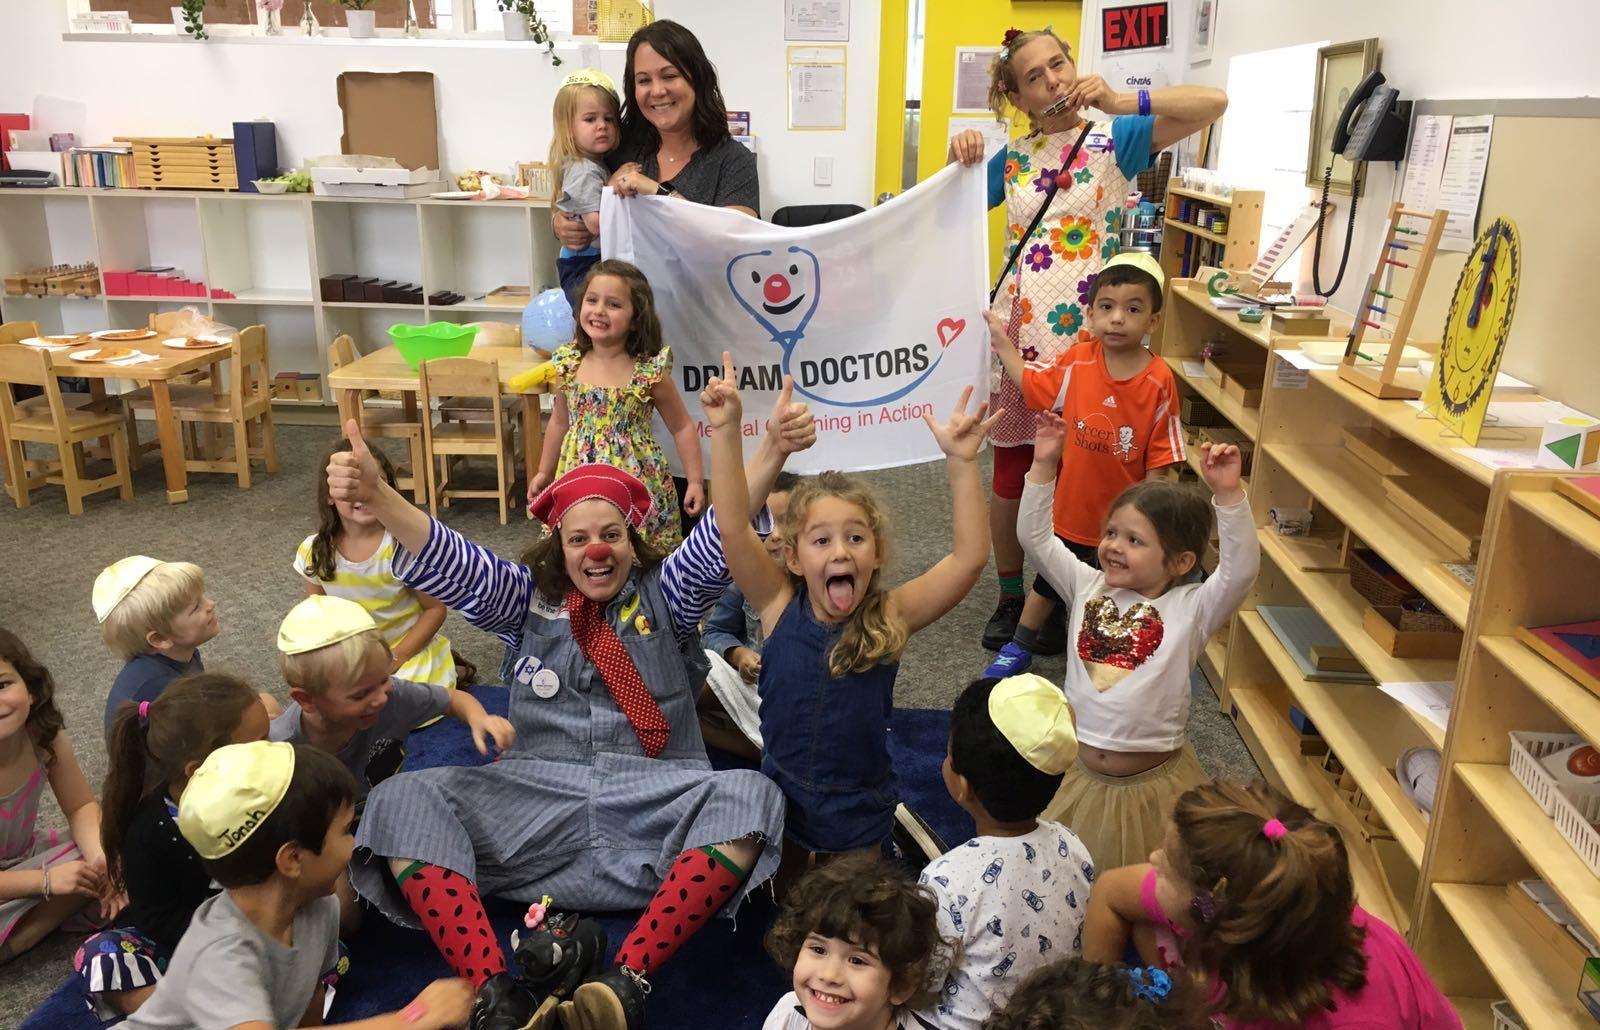 US hurricane victims welcome Israeli aid workers   ISRAEL21c